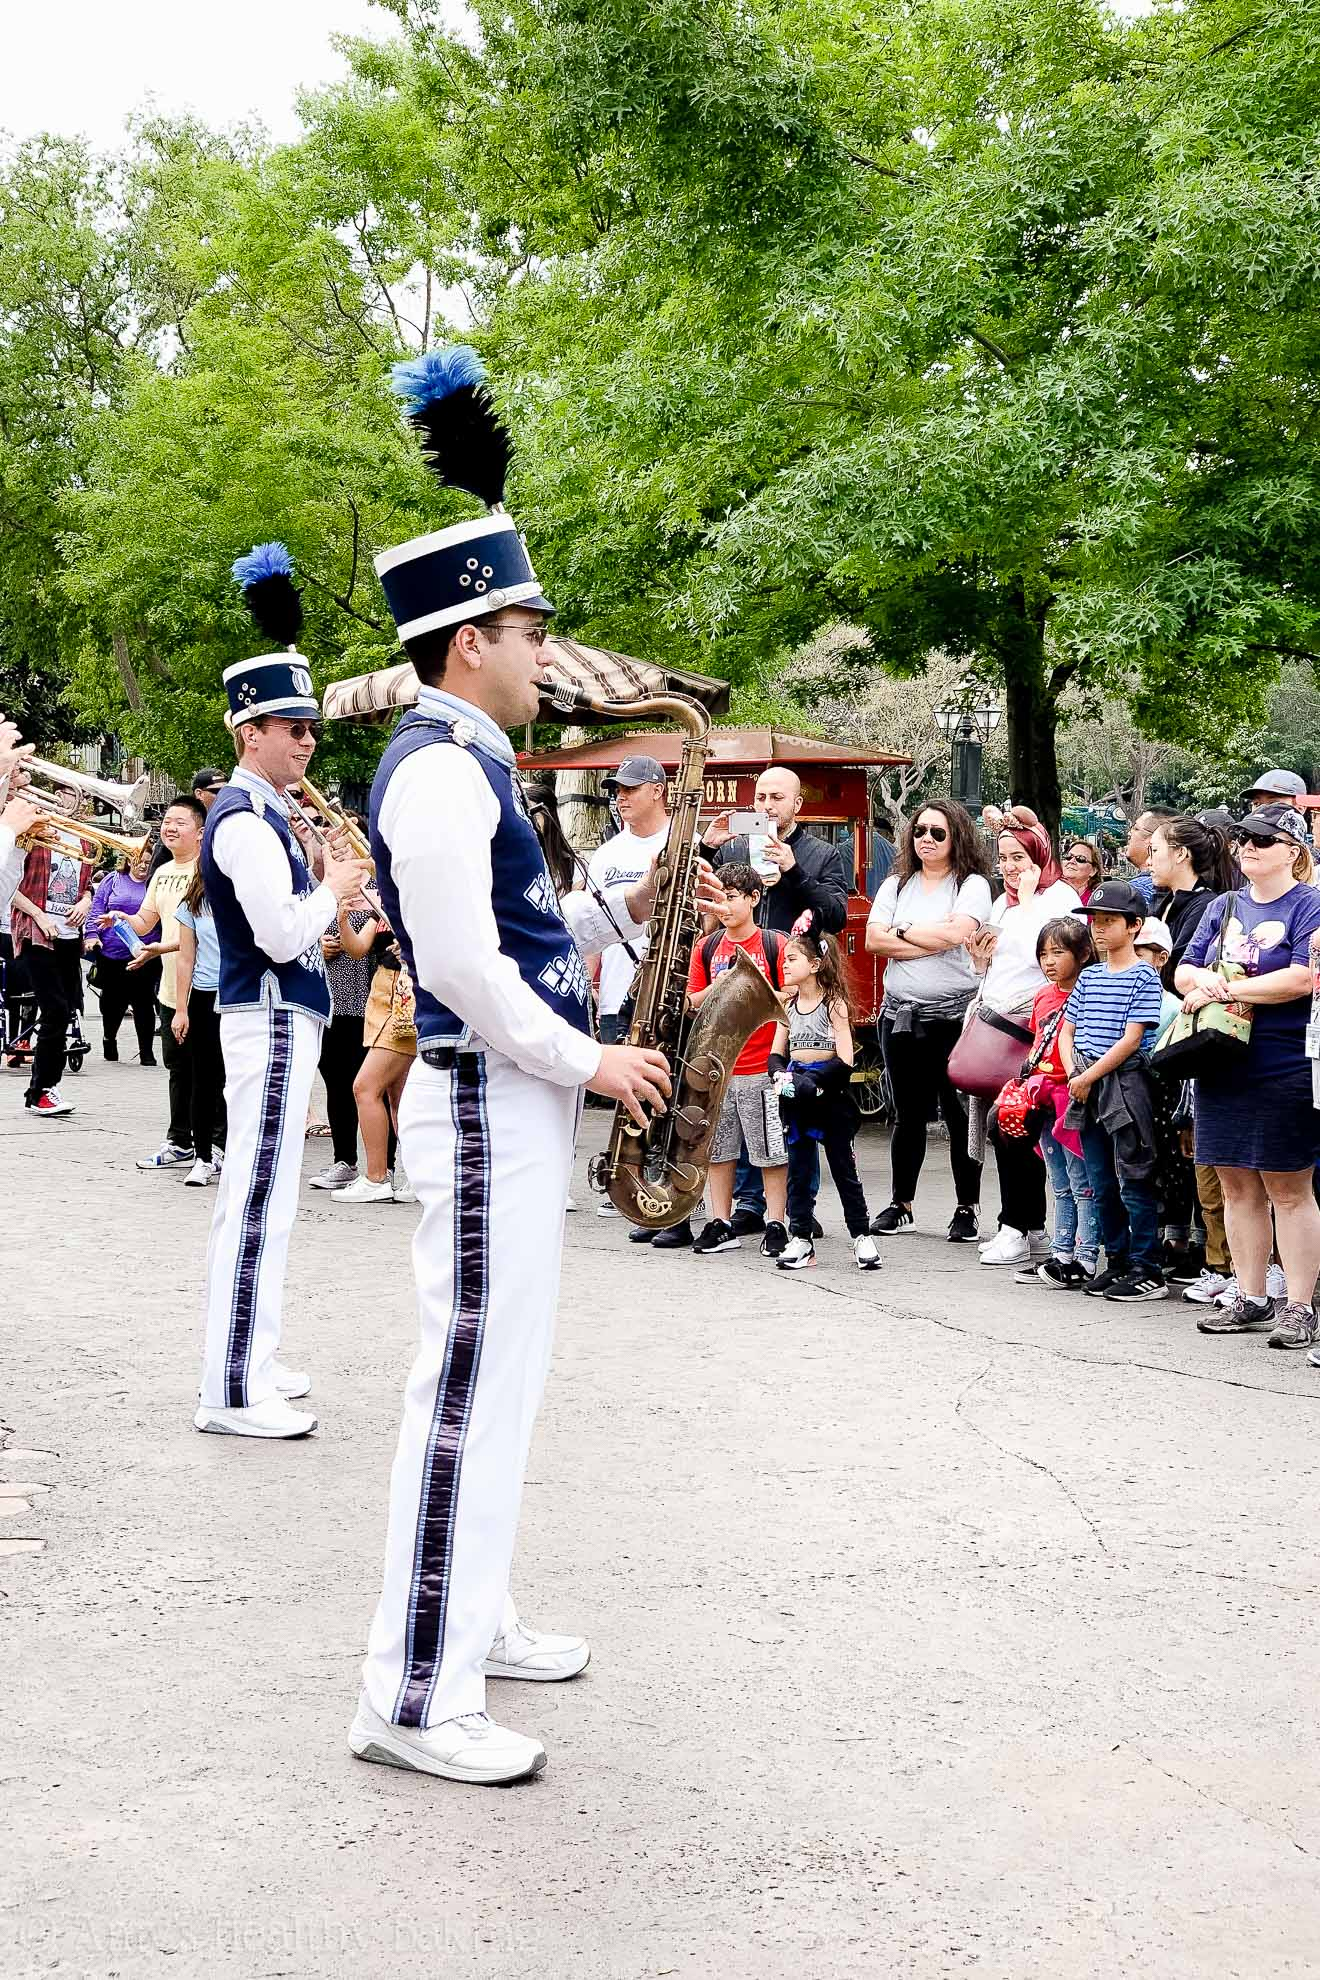 Michael Czaja playing tenor sax in the Disneyland Band - Anaheim